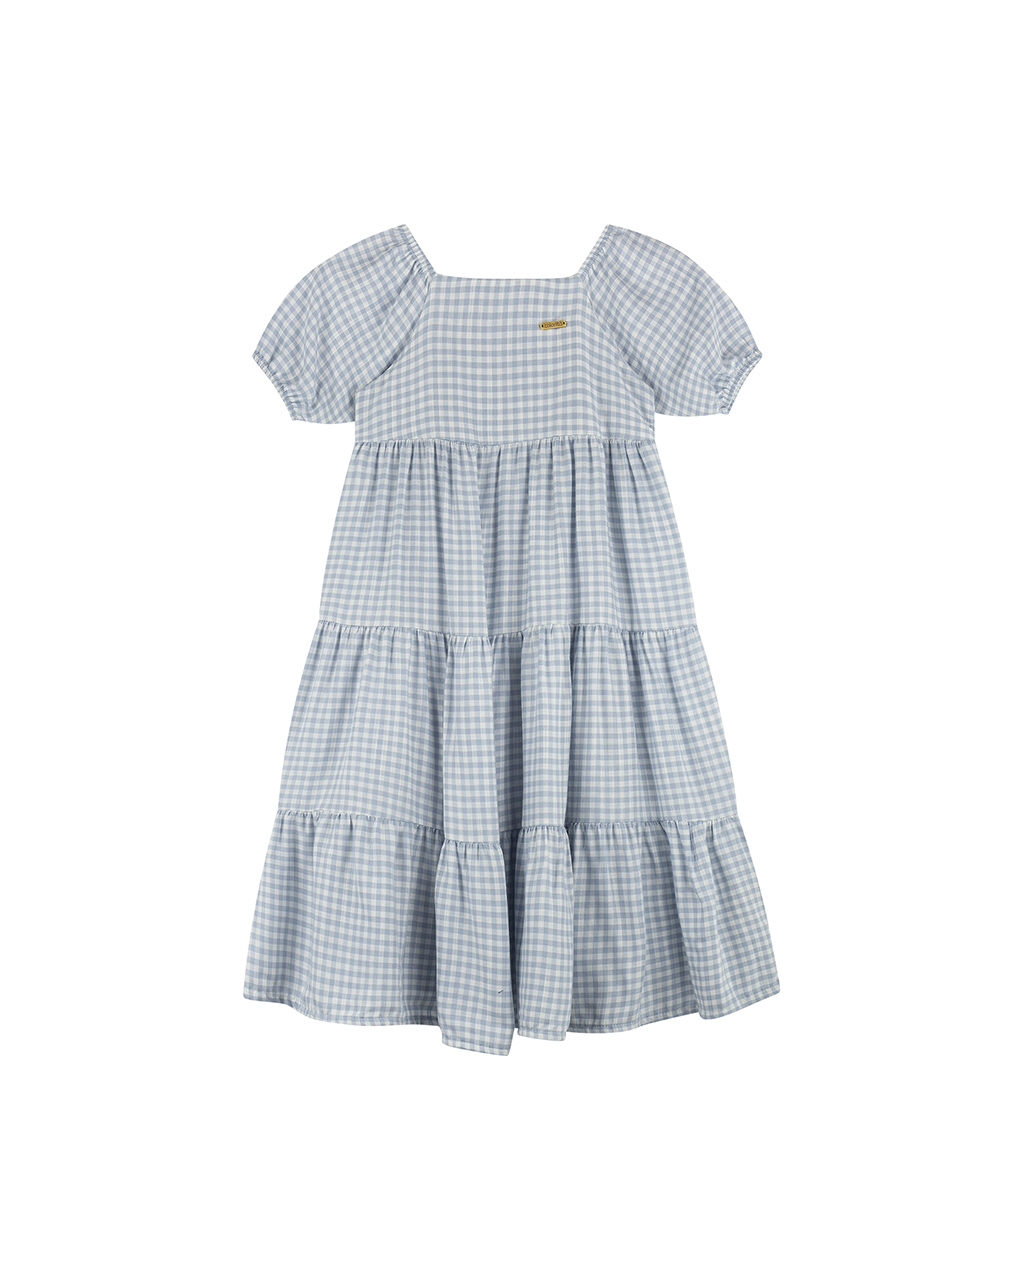 Vestido Infantil com Manga Xadrez Off White e Azul Colorittá